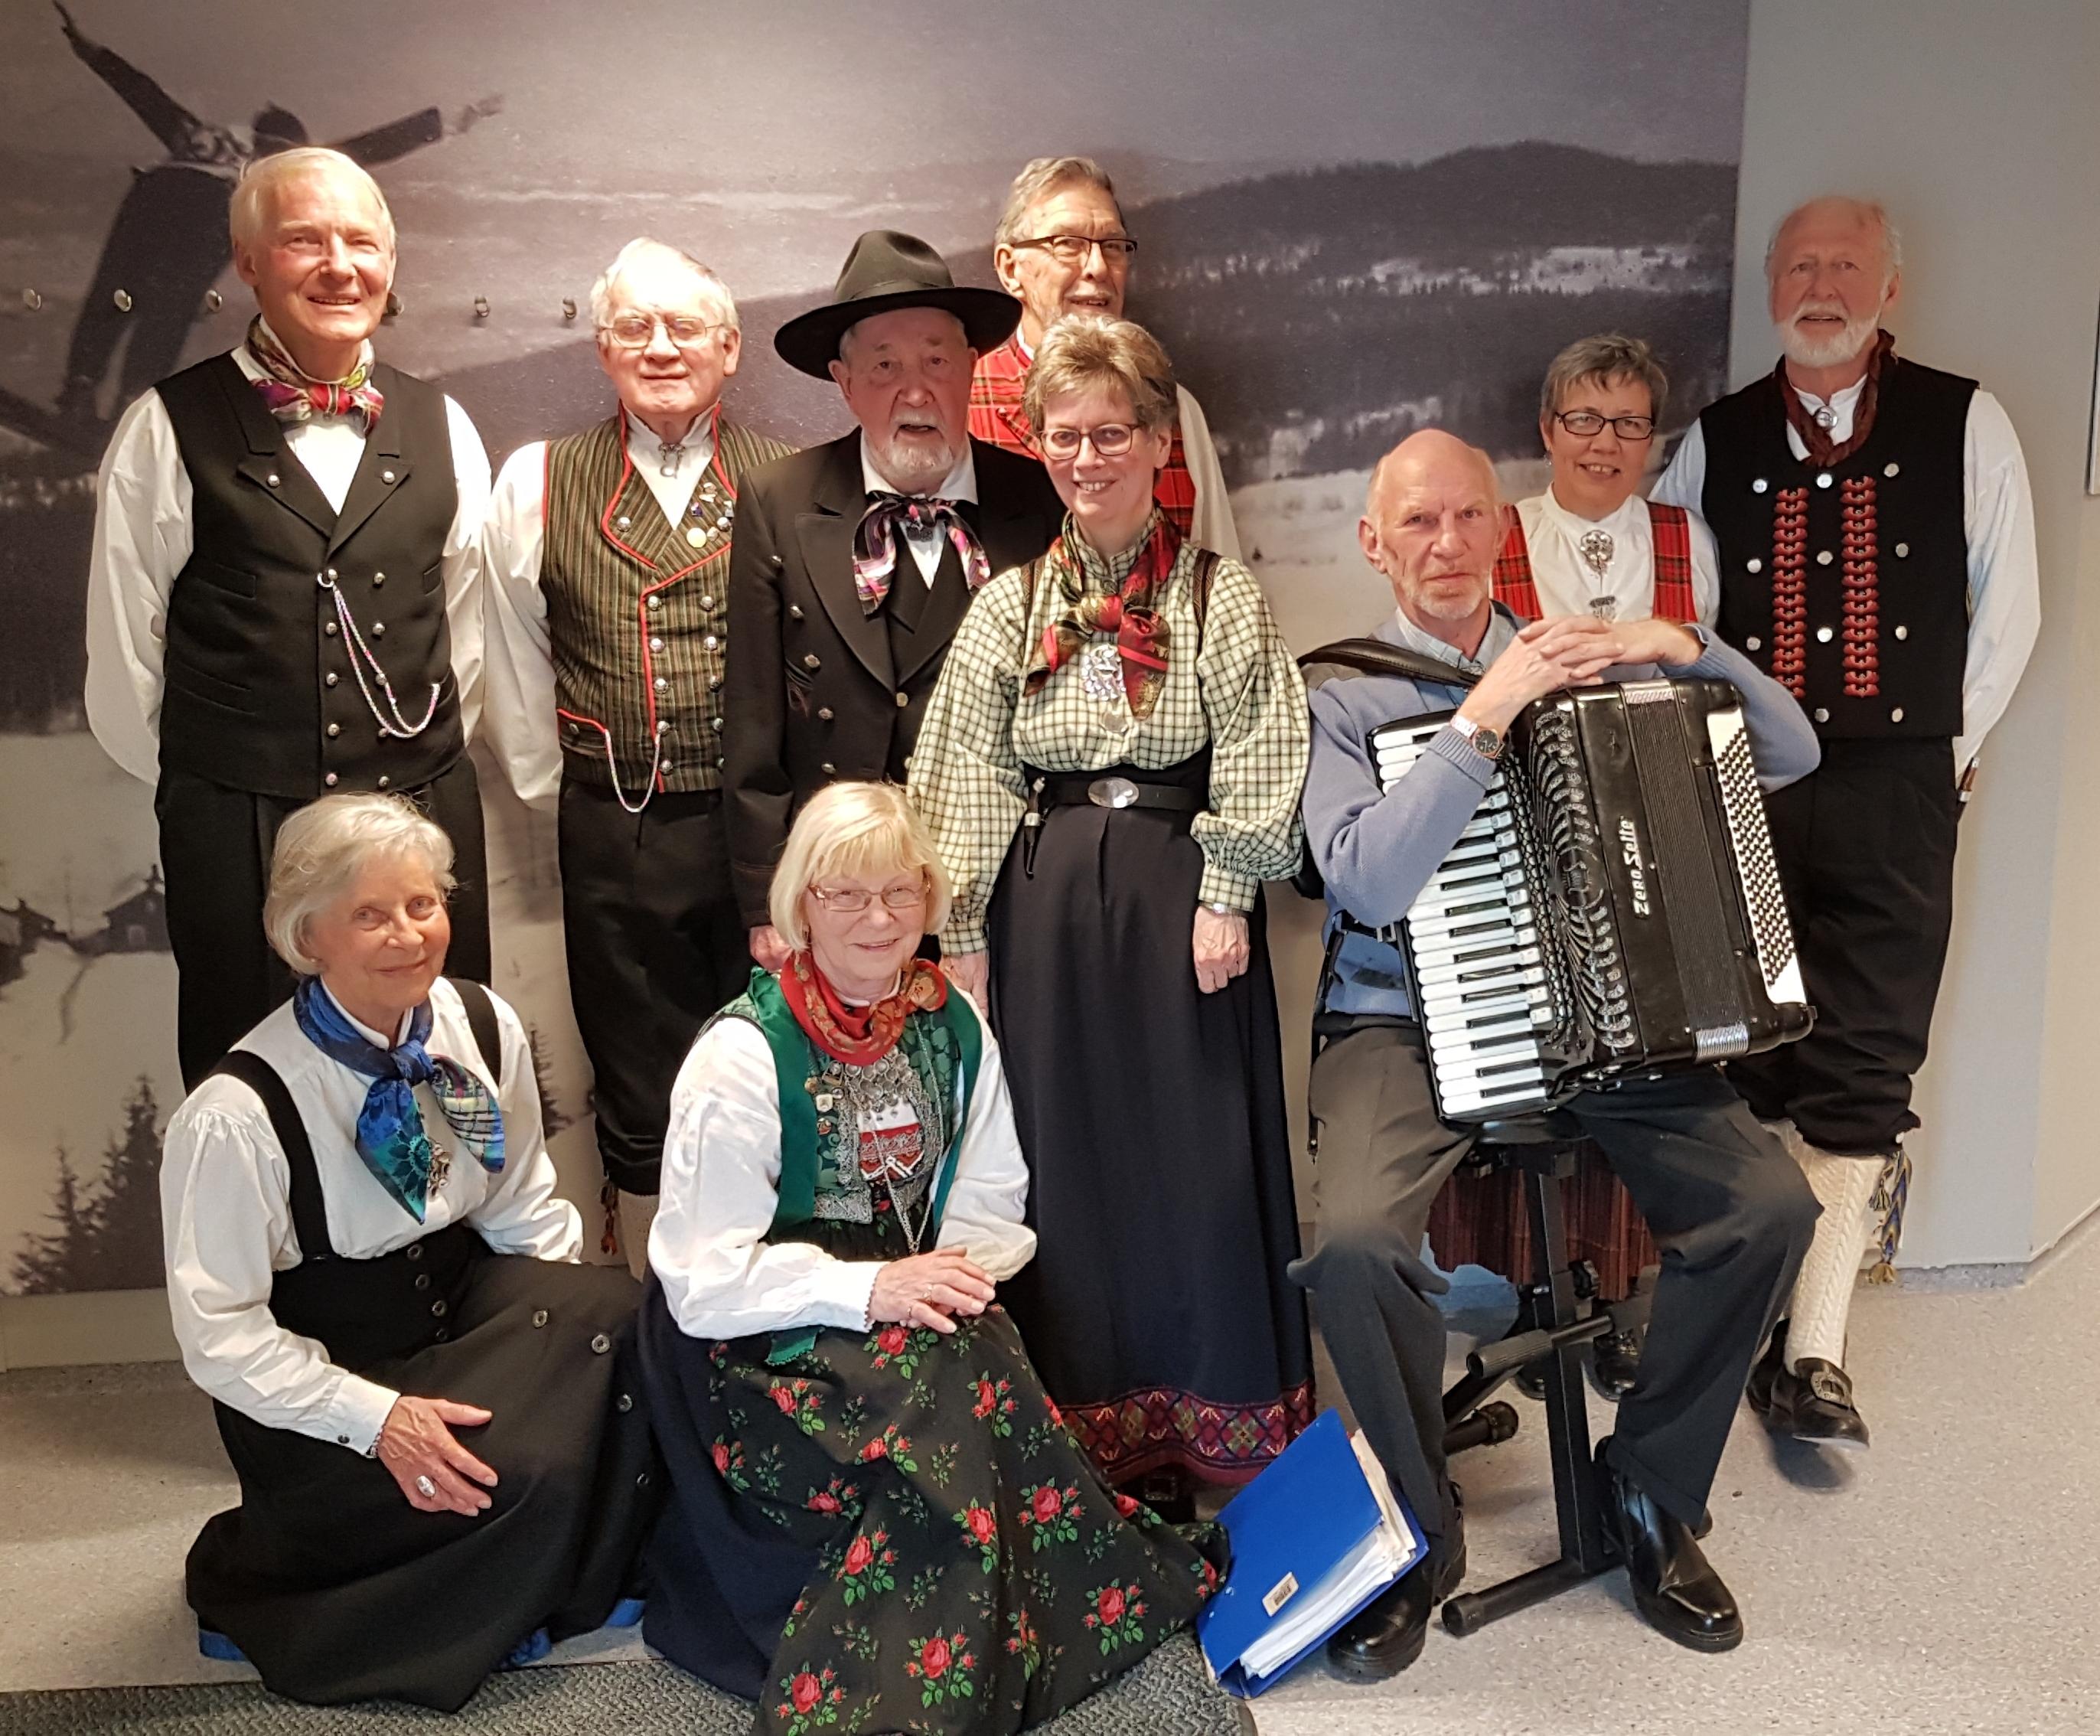 Leikarringen_Noreg_Fremsyning_20180322_202750.jpg